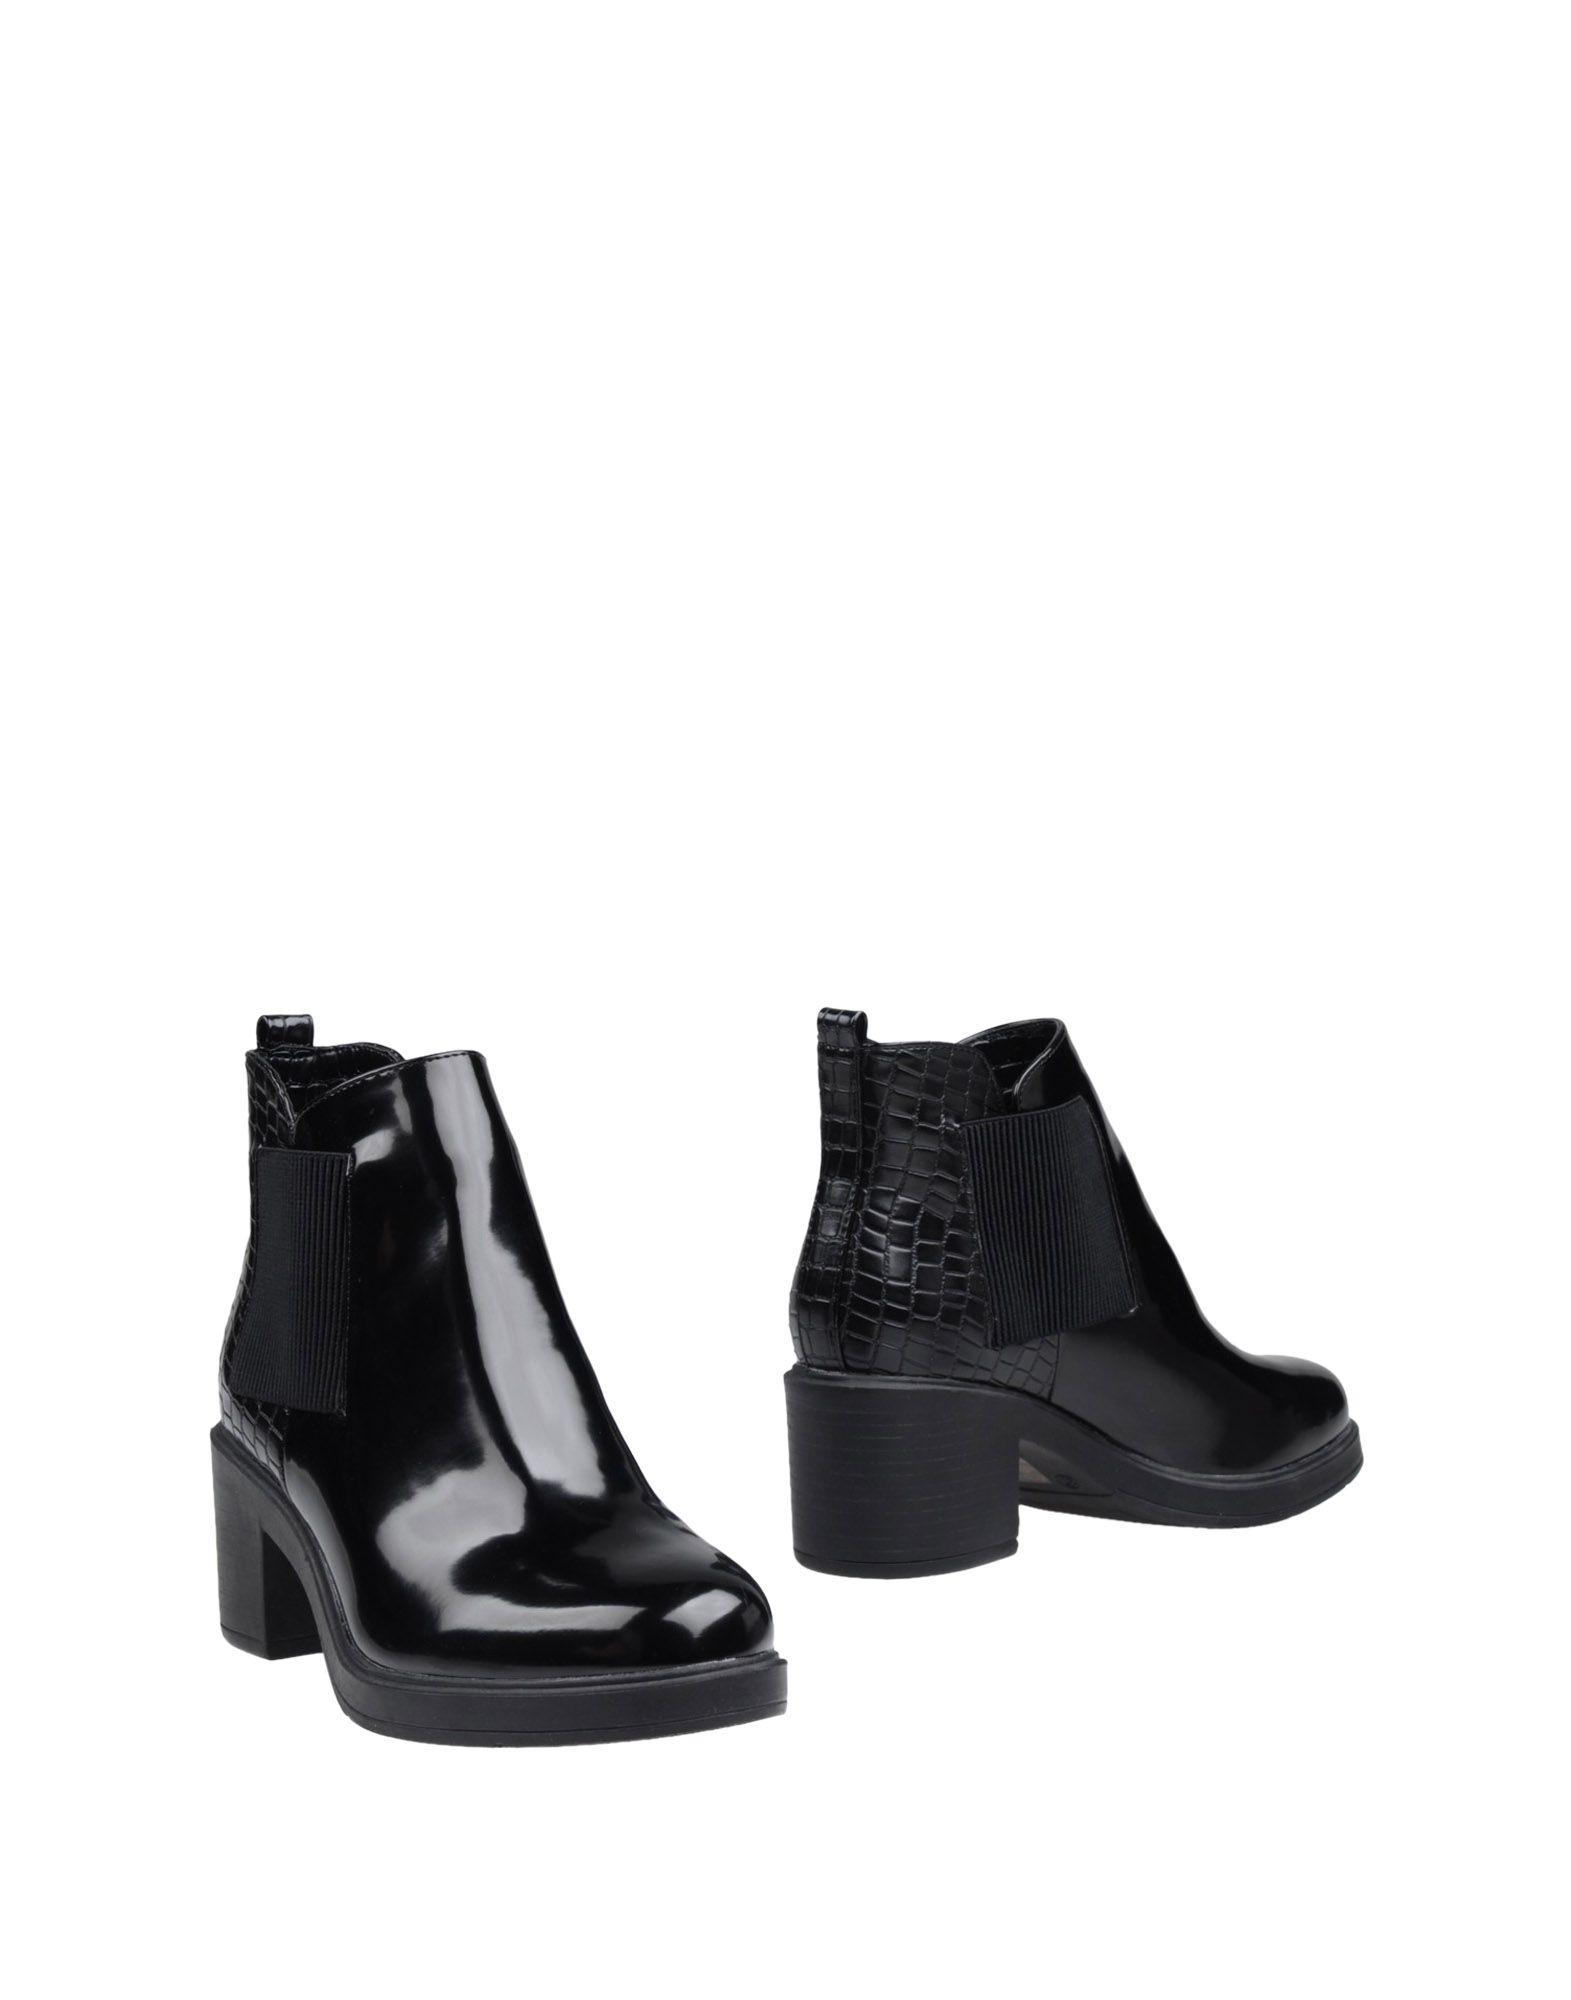 Chelsea Boots 11291487AV Francesco Milano Donna - 11291487AV Boots a428a6